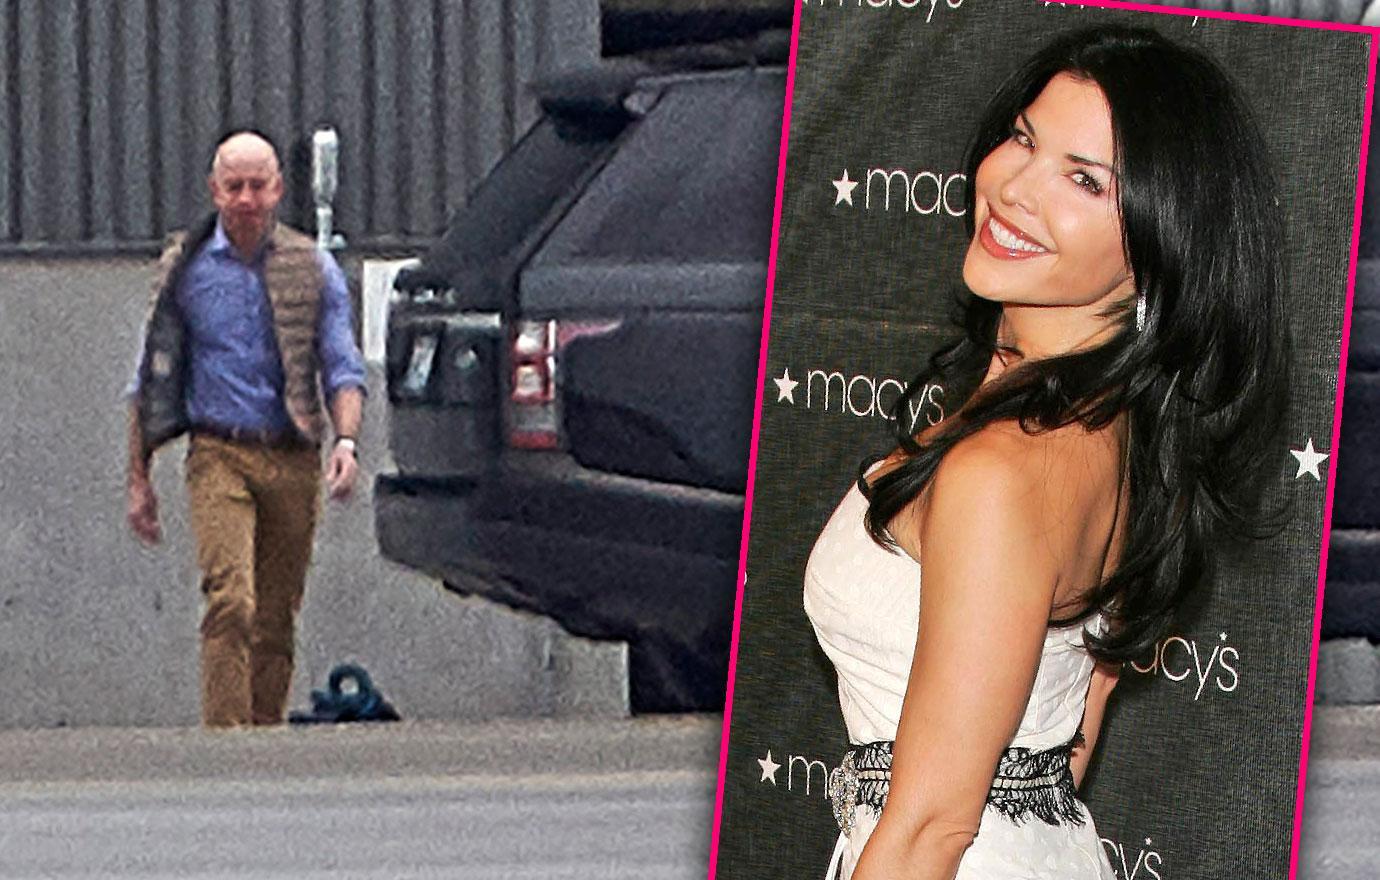 Jeff Bezos Seen In First Photos Since Mistress Scandal